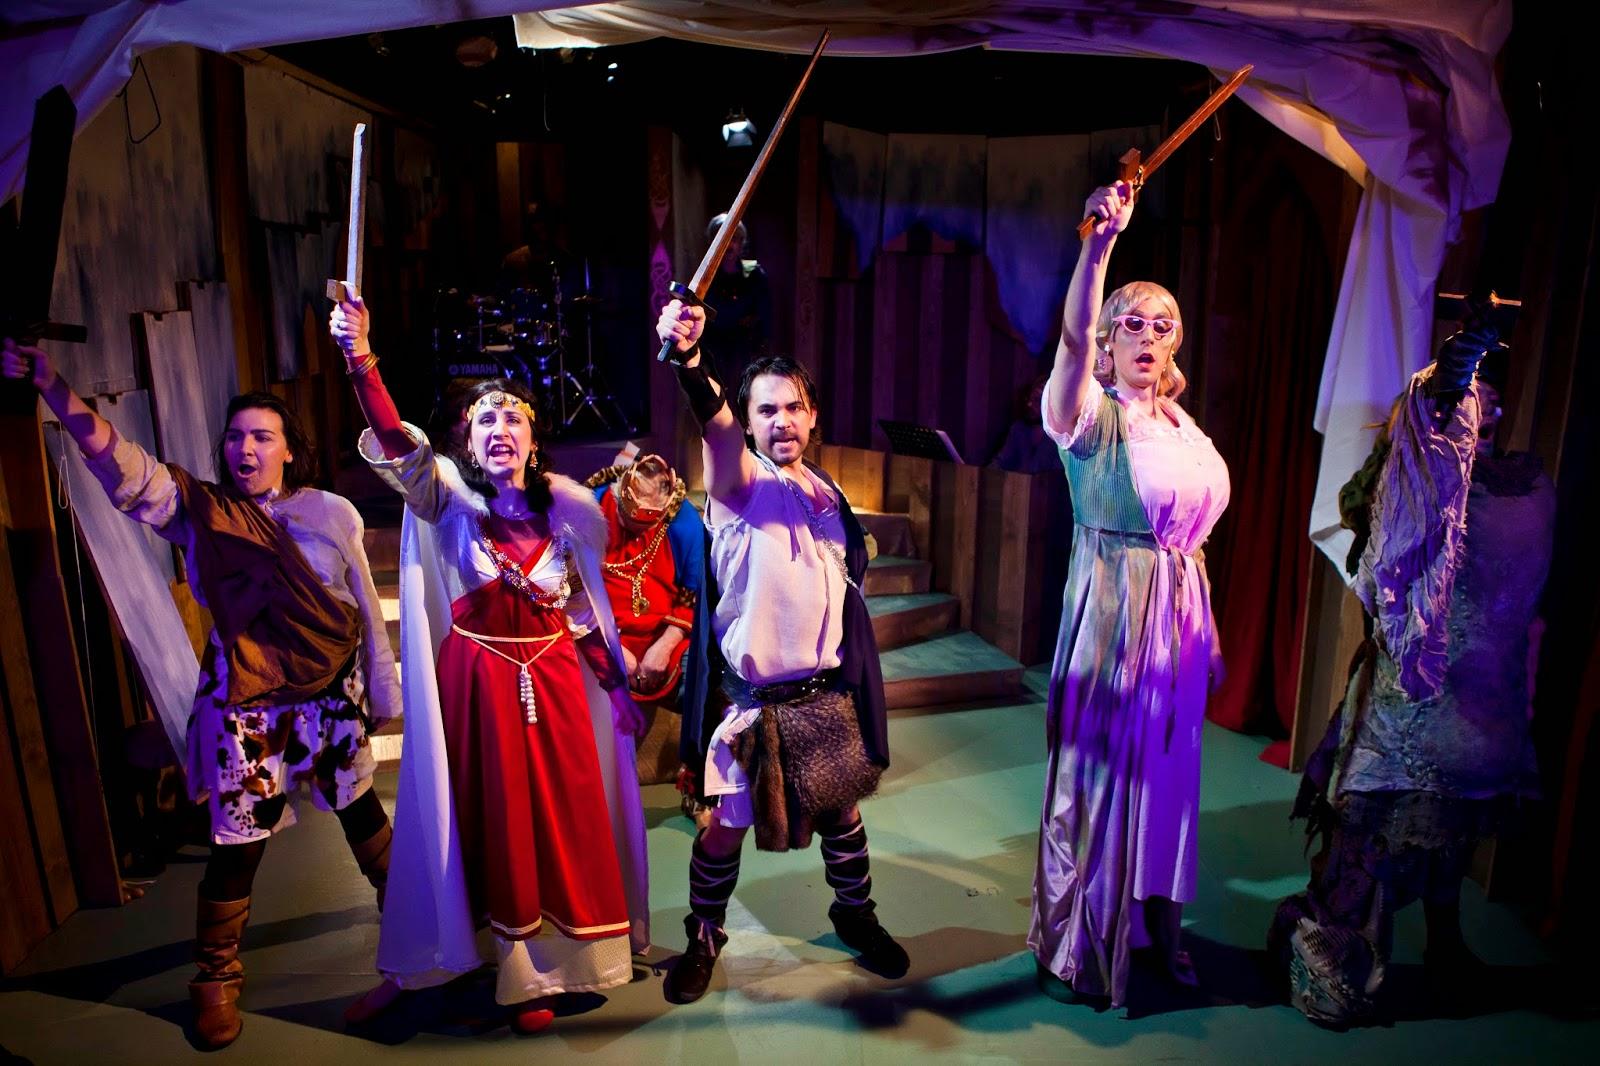 Beowulf - Charles Court Opera in 2011 - Amy J Payne (Wiglaf),Catrine Kirkman (Princess Hrothmund), Simon Masterton-Smith (King Hrothgar), Kevin Kyle (Beowulf), John Savournin (Grendel's Mother) Philip Lee (Grendel),  Photographer: Richard Davenport